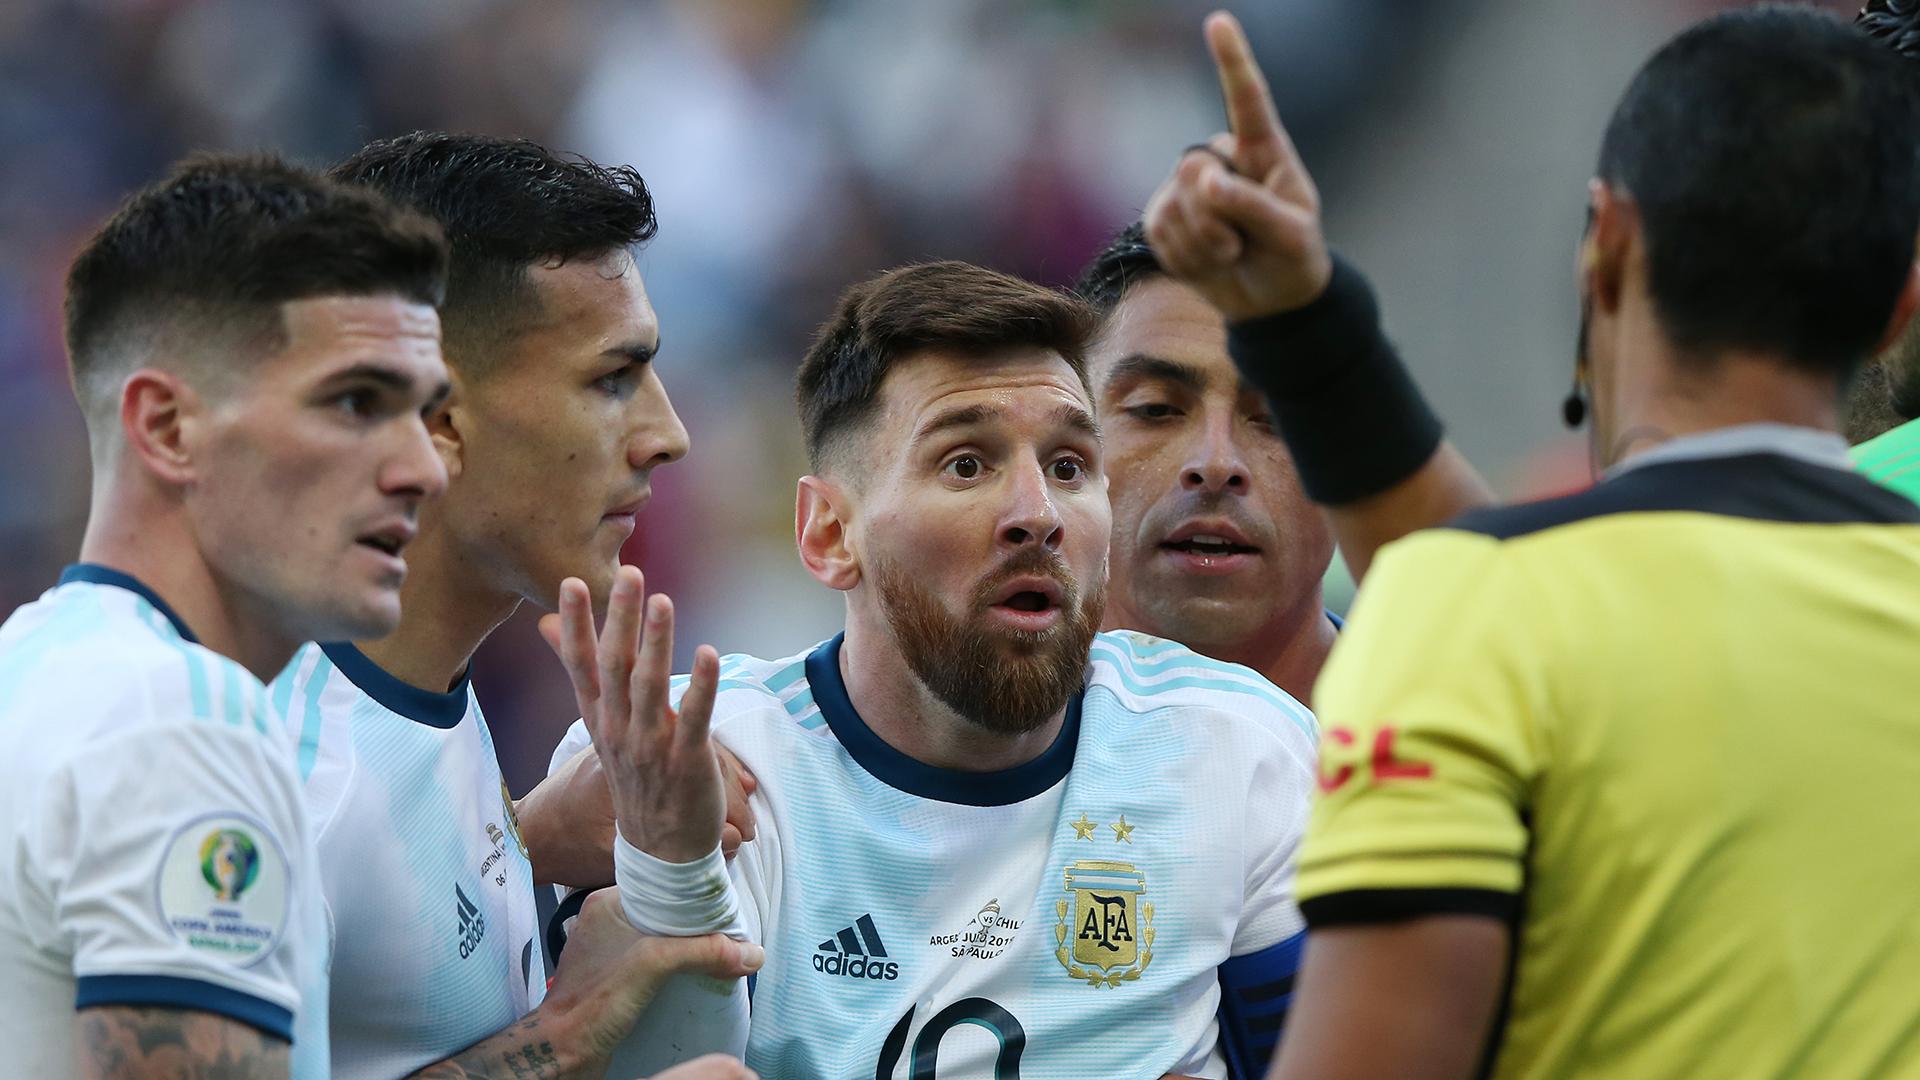 Will Lionel Messi play at Copa America 2021?